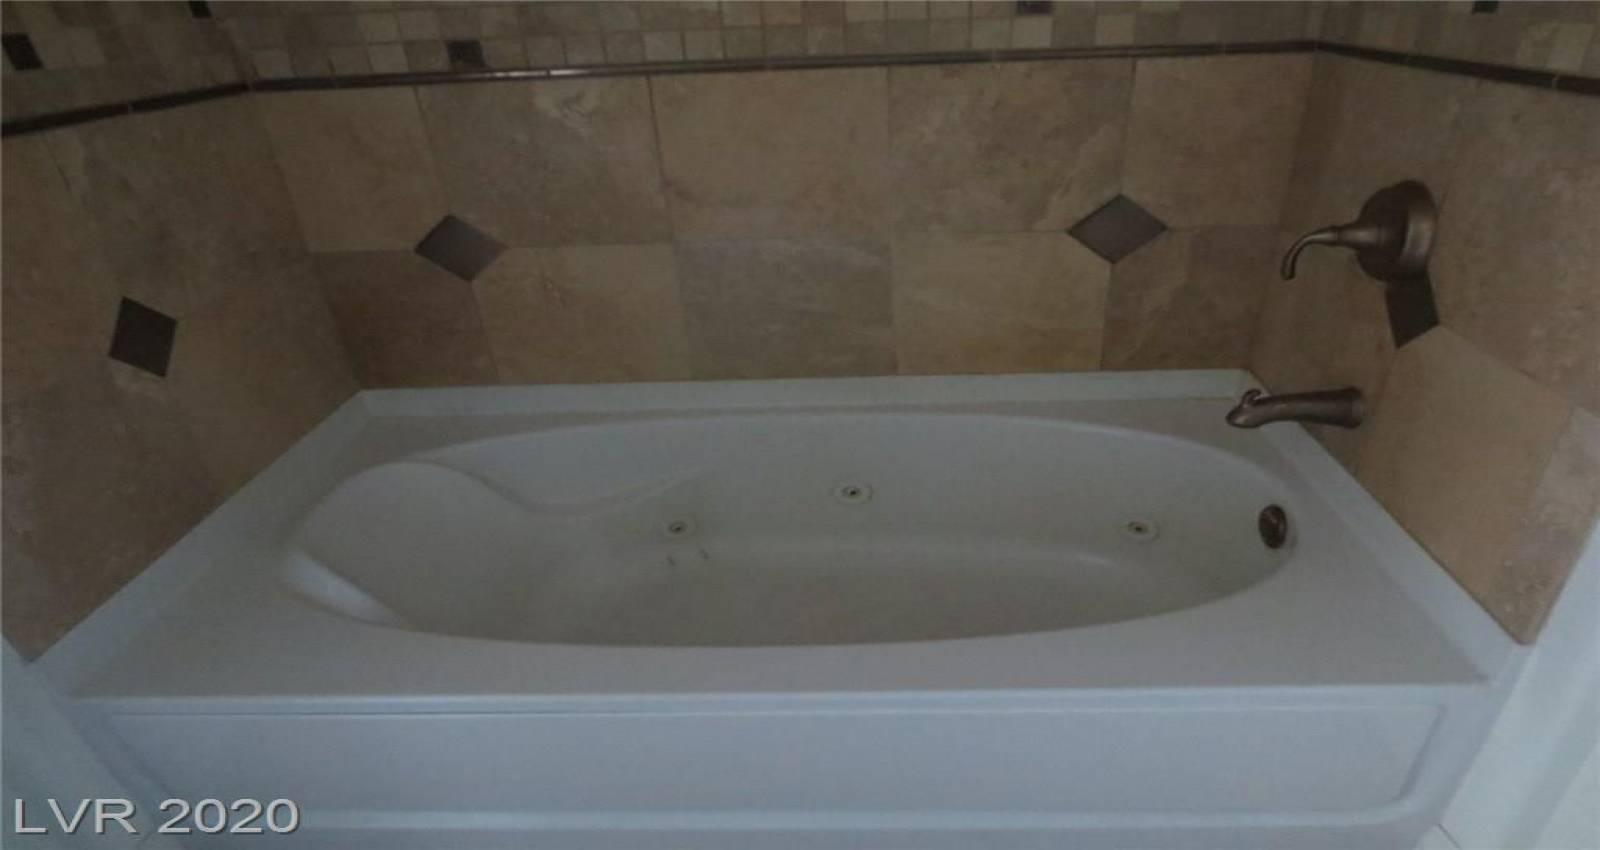 8255 LAS VEGAS Boulevard, Las Vegas, Nevada 89123, 1 Bedroom Bedrooms, 4 Rooms Rooms,1 BathroomBathrooms,Residential Rental,For Rent,LAS VEGAS,2173491